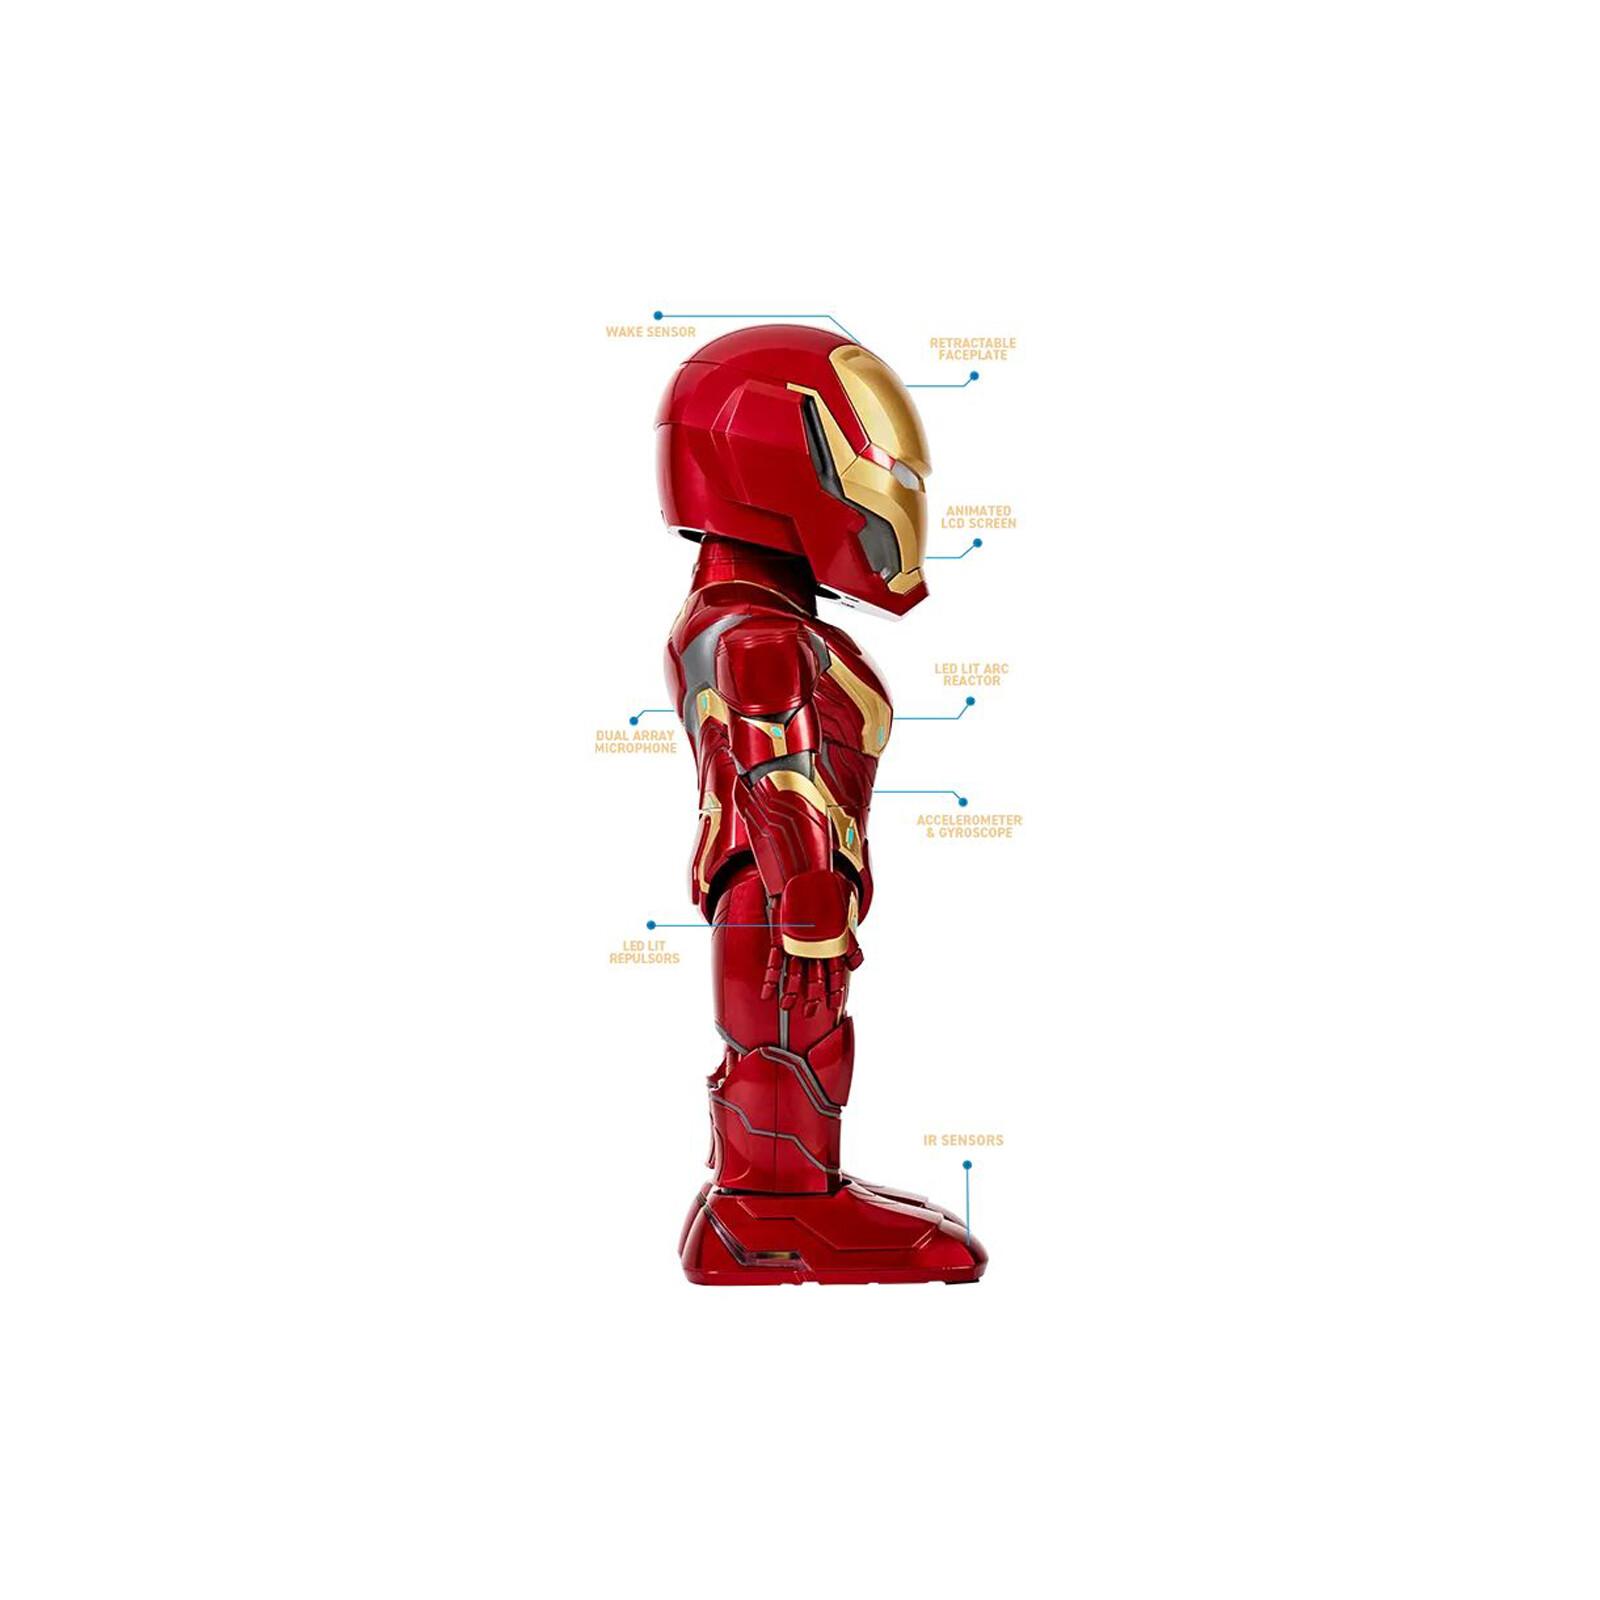 UbTech MK50 Iron Man Edition